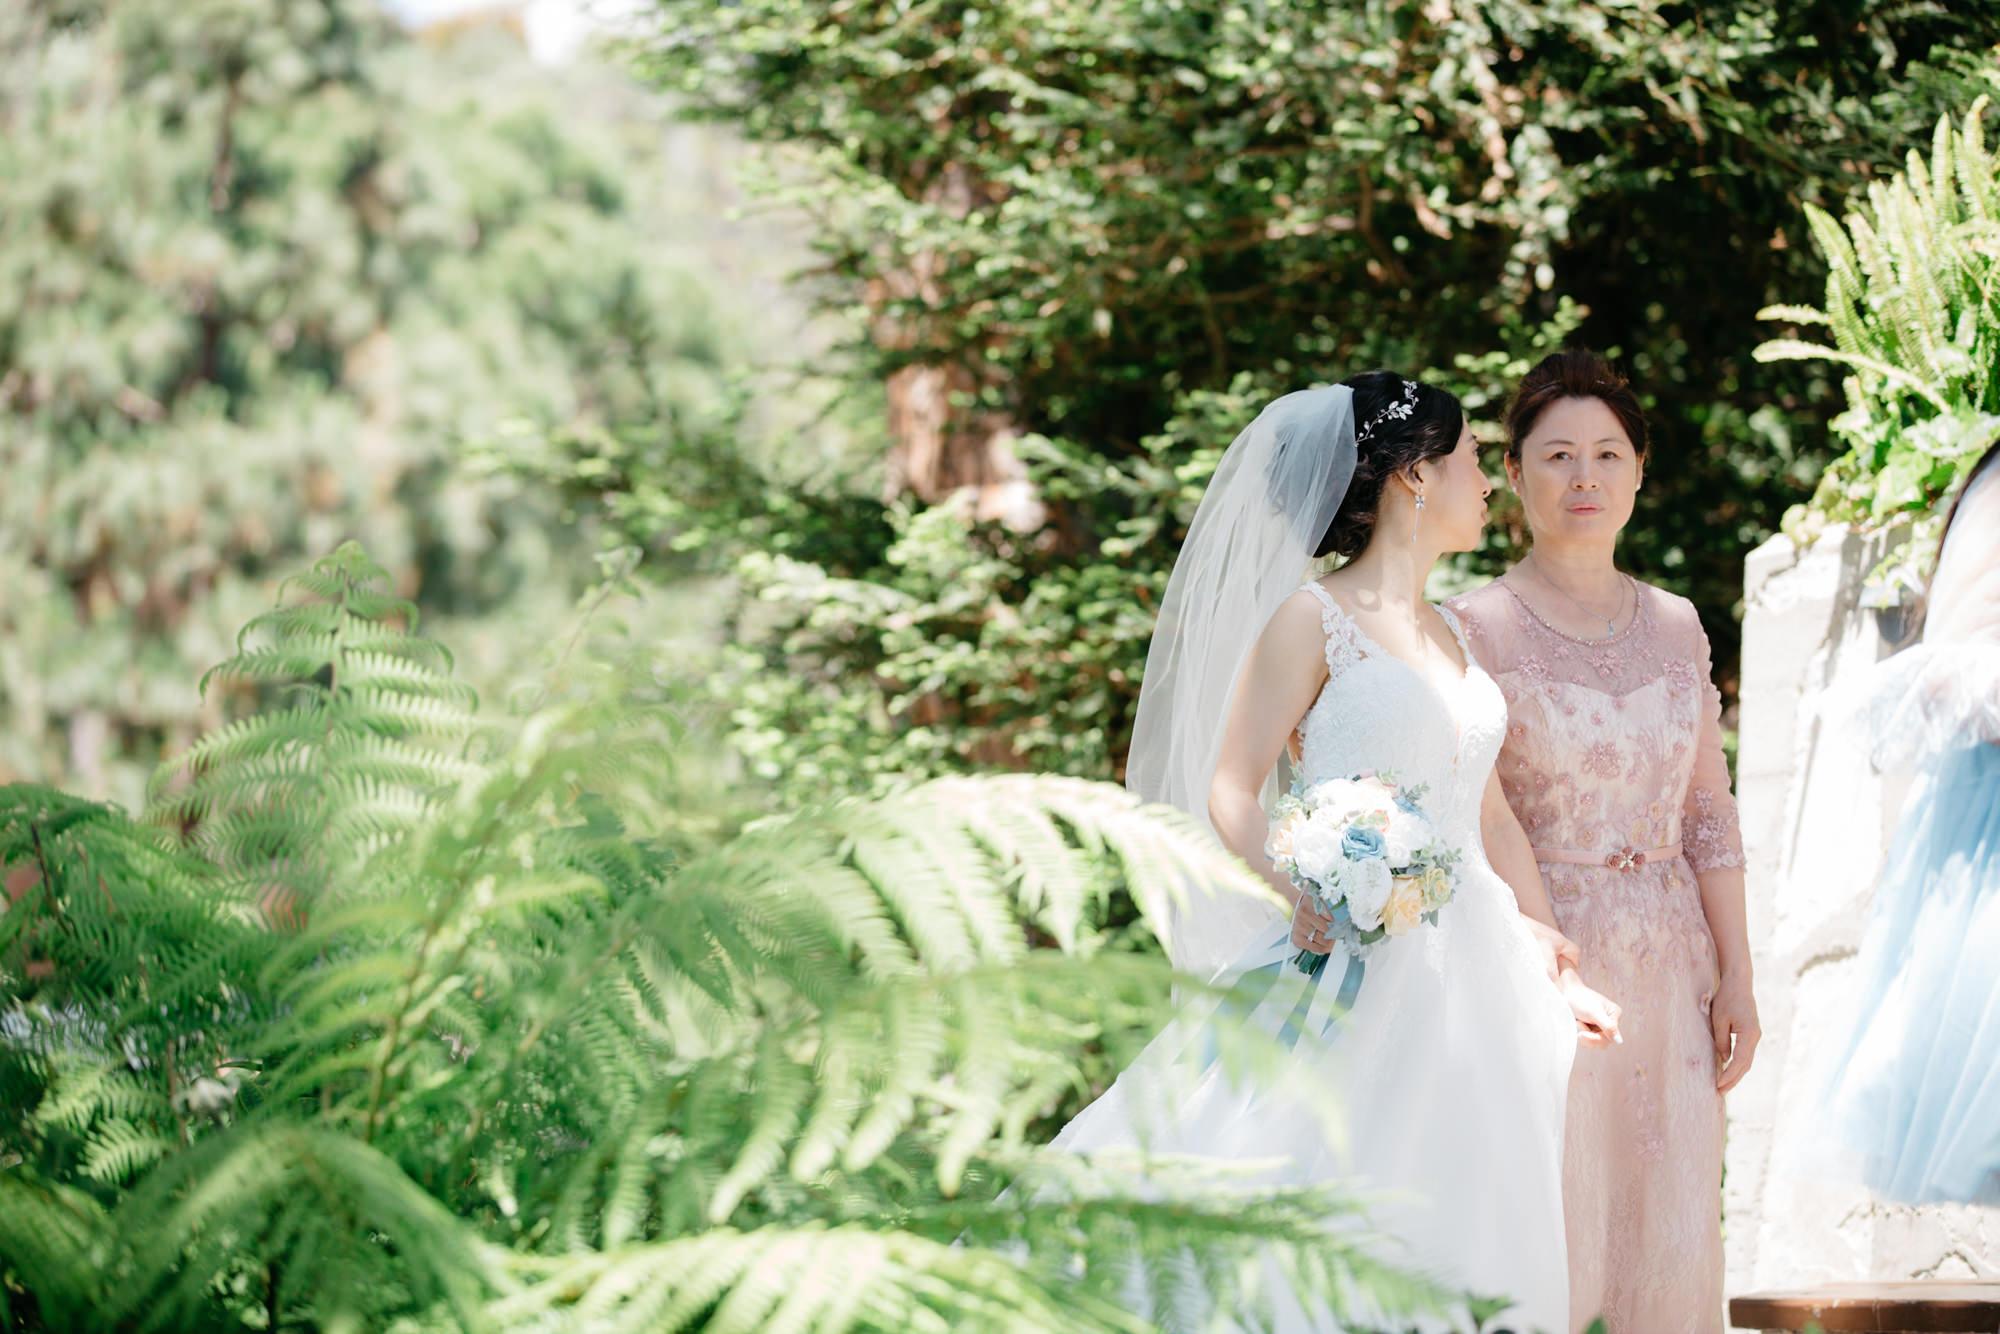 Tian and Cherry by Jenna Pangan-21.jpg